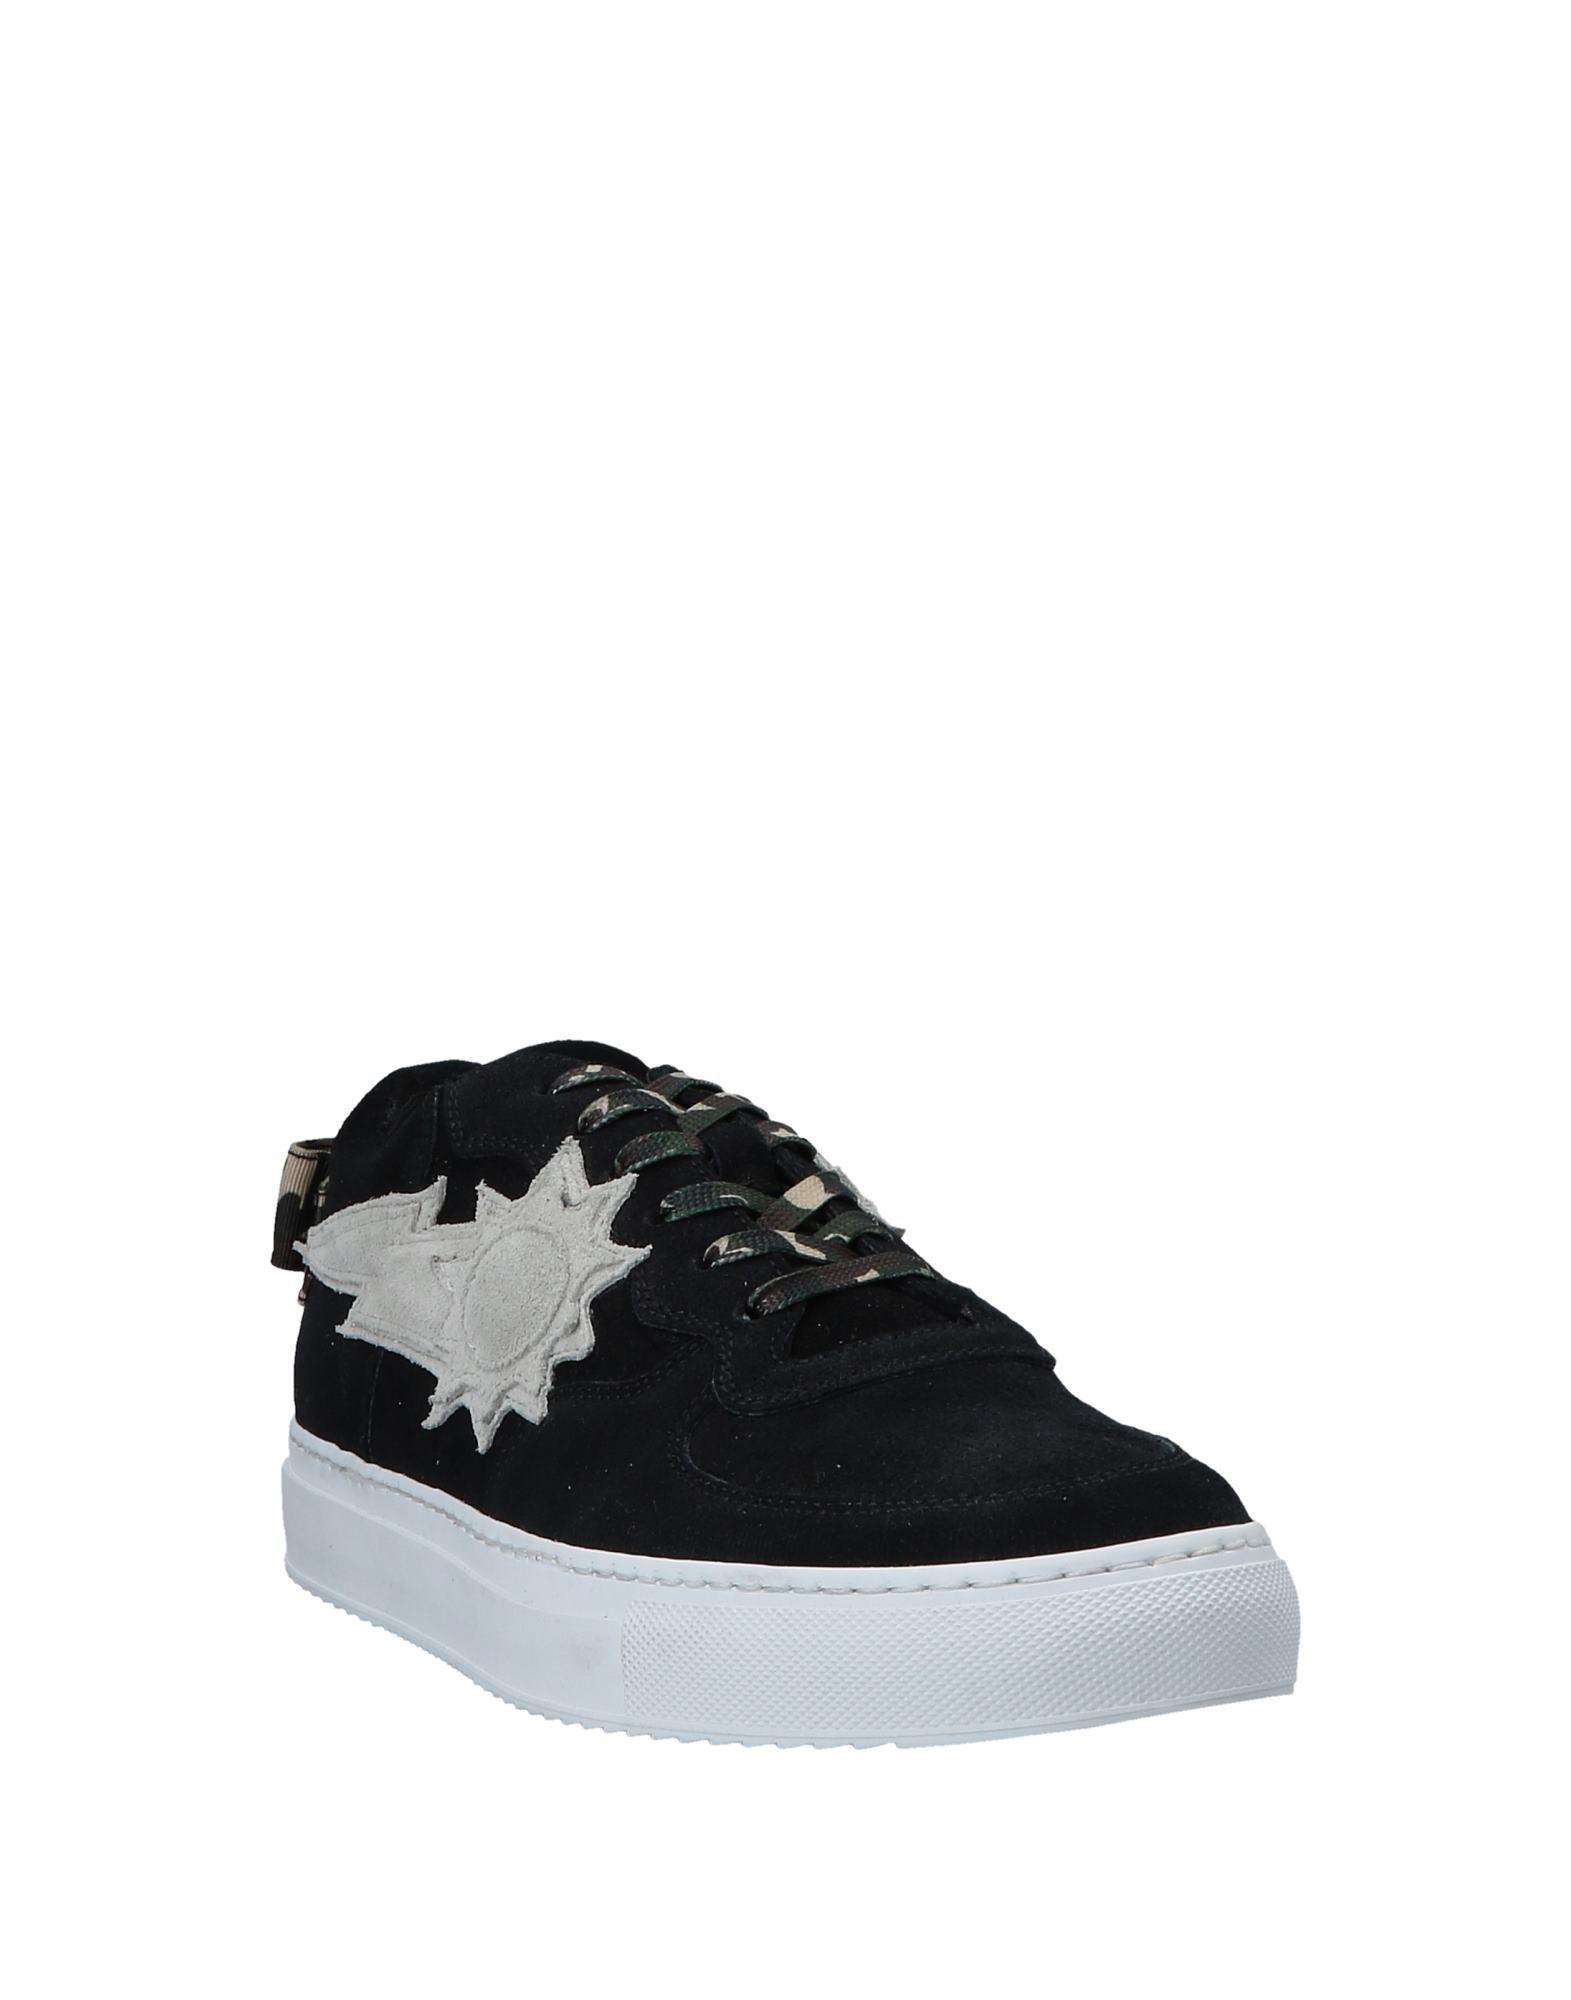 Rabatt echte Herren Schuhe Urban Sun Sneakers Herren echte  11549042VR 11e6ca